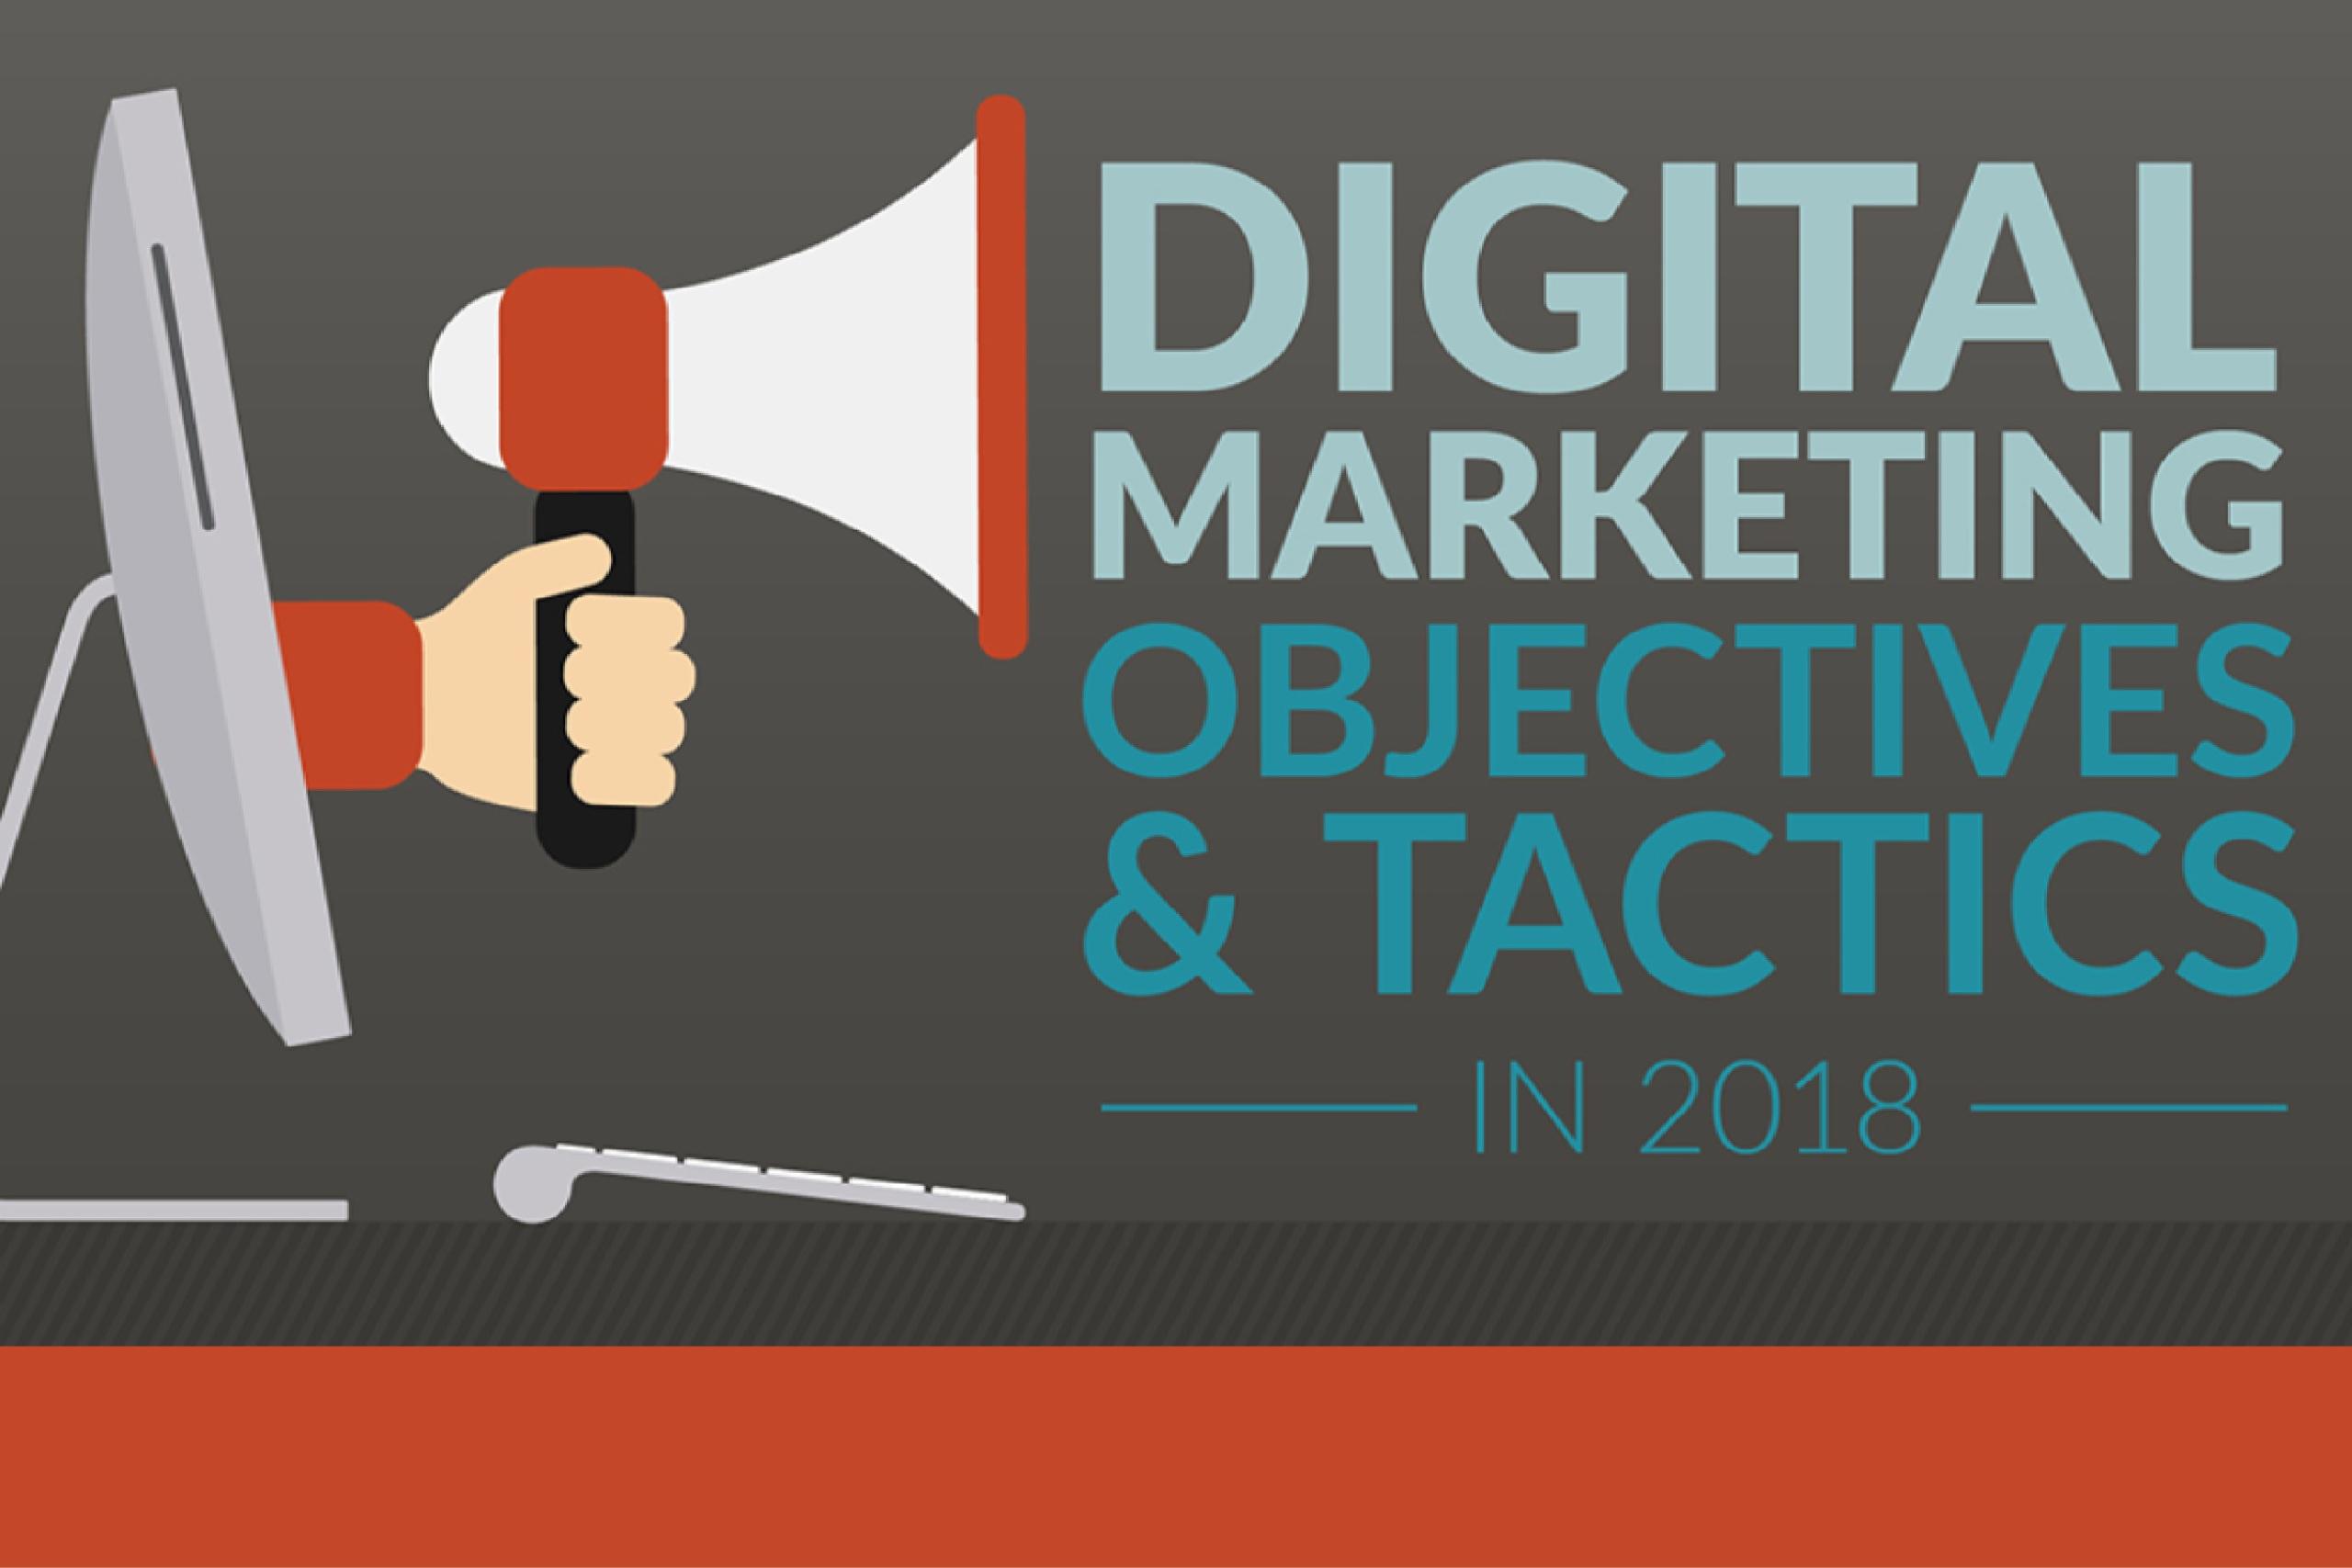 Lead Generation Tops Digital Marketing Tactics In 2018